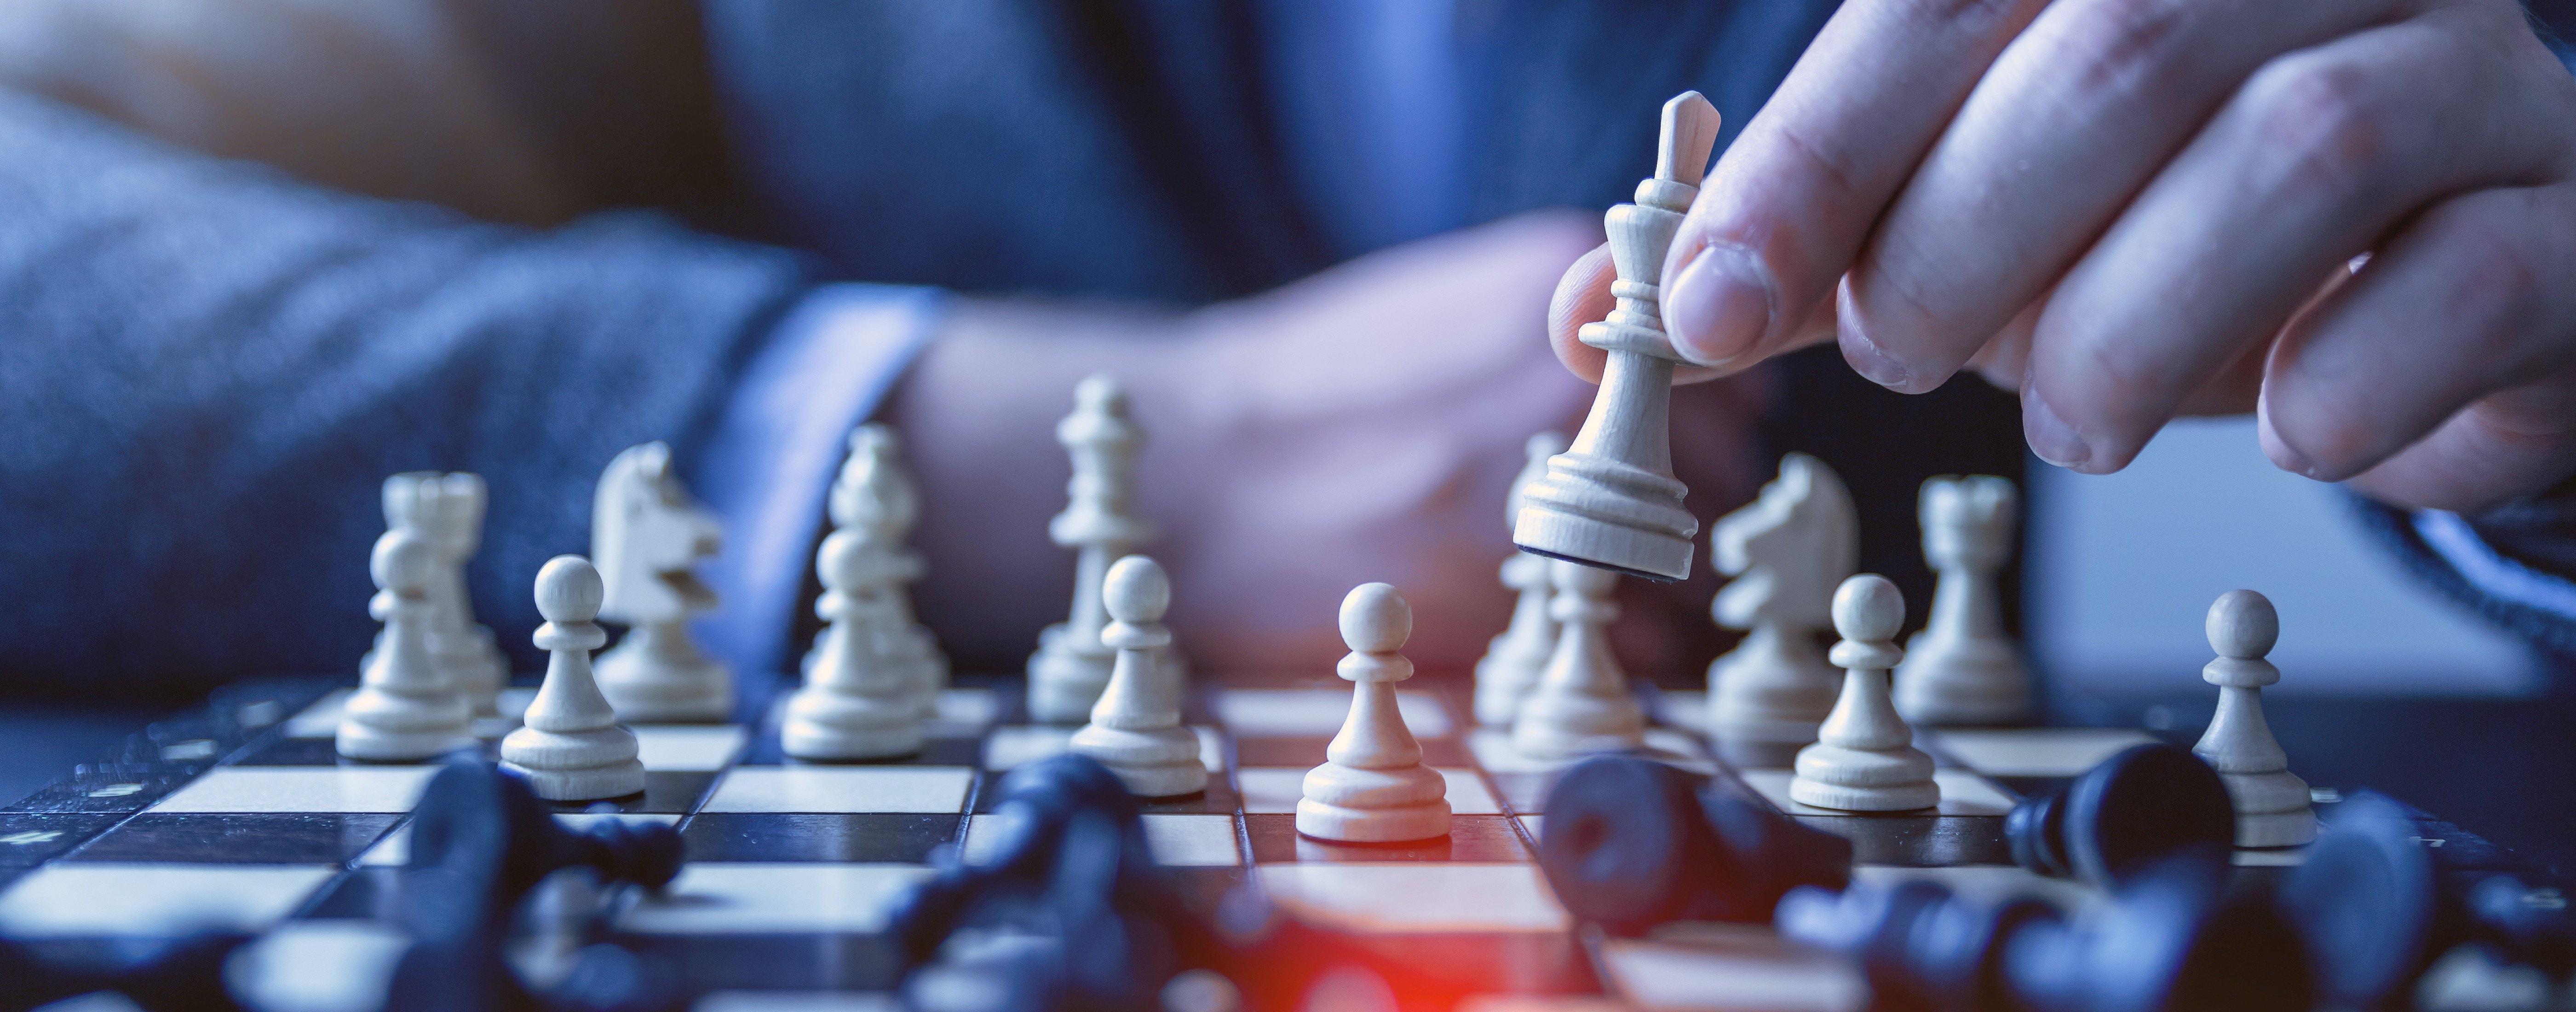 chess strategy banner - jeshoots-com-632498-unsplash